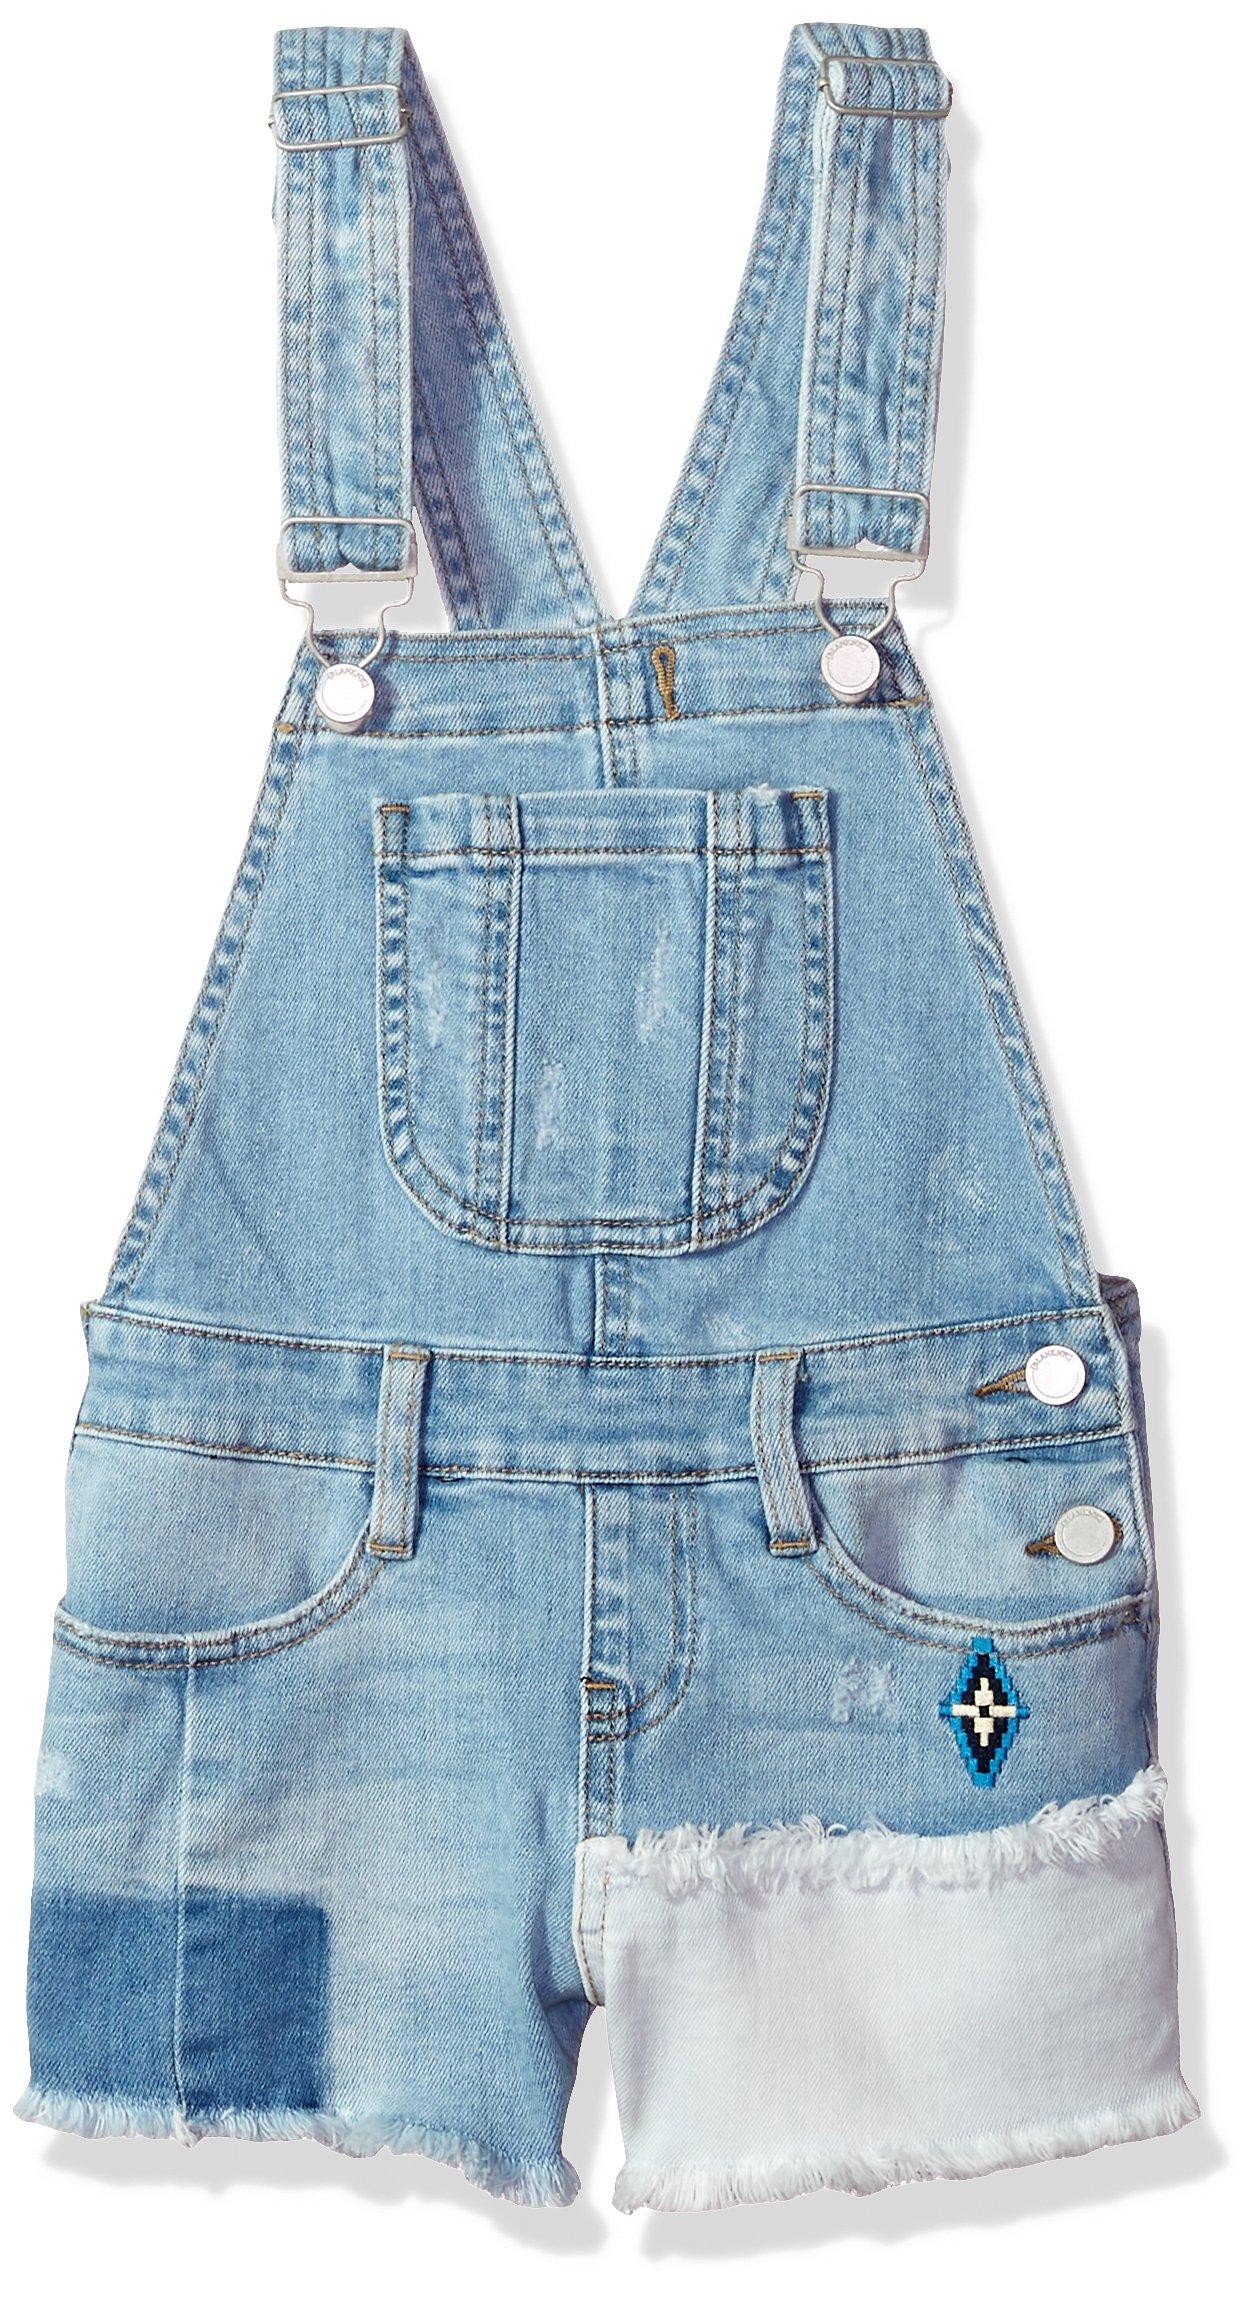 [BLANKNYC] Big Girl's Shortalls Pants, Down The Shore, 12